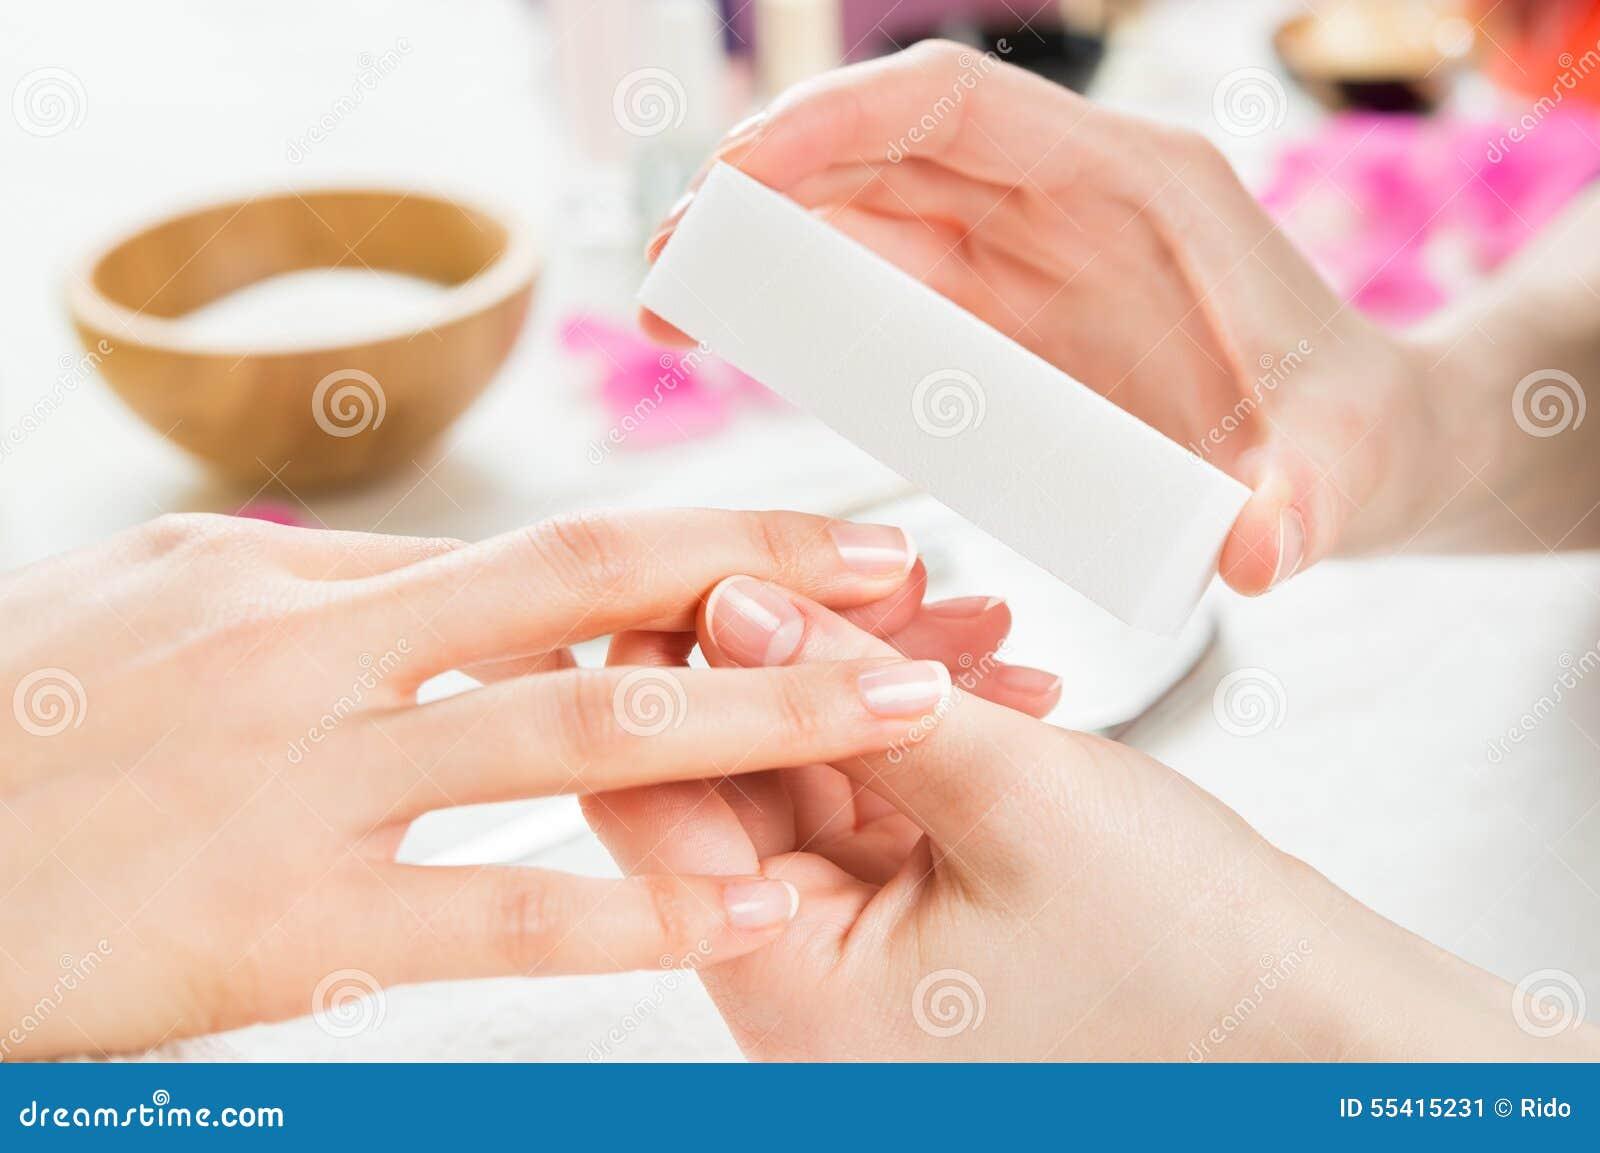 Manicure With Buffer At Nail Salon